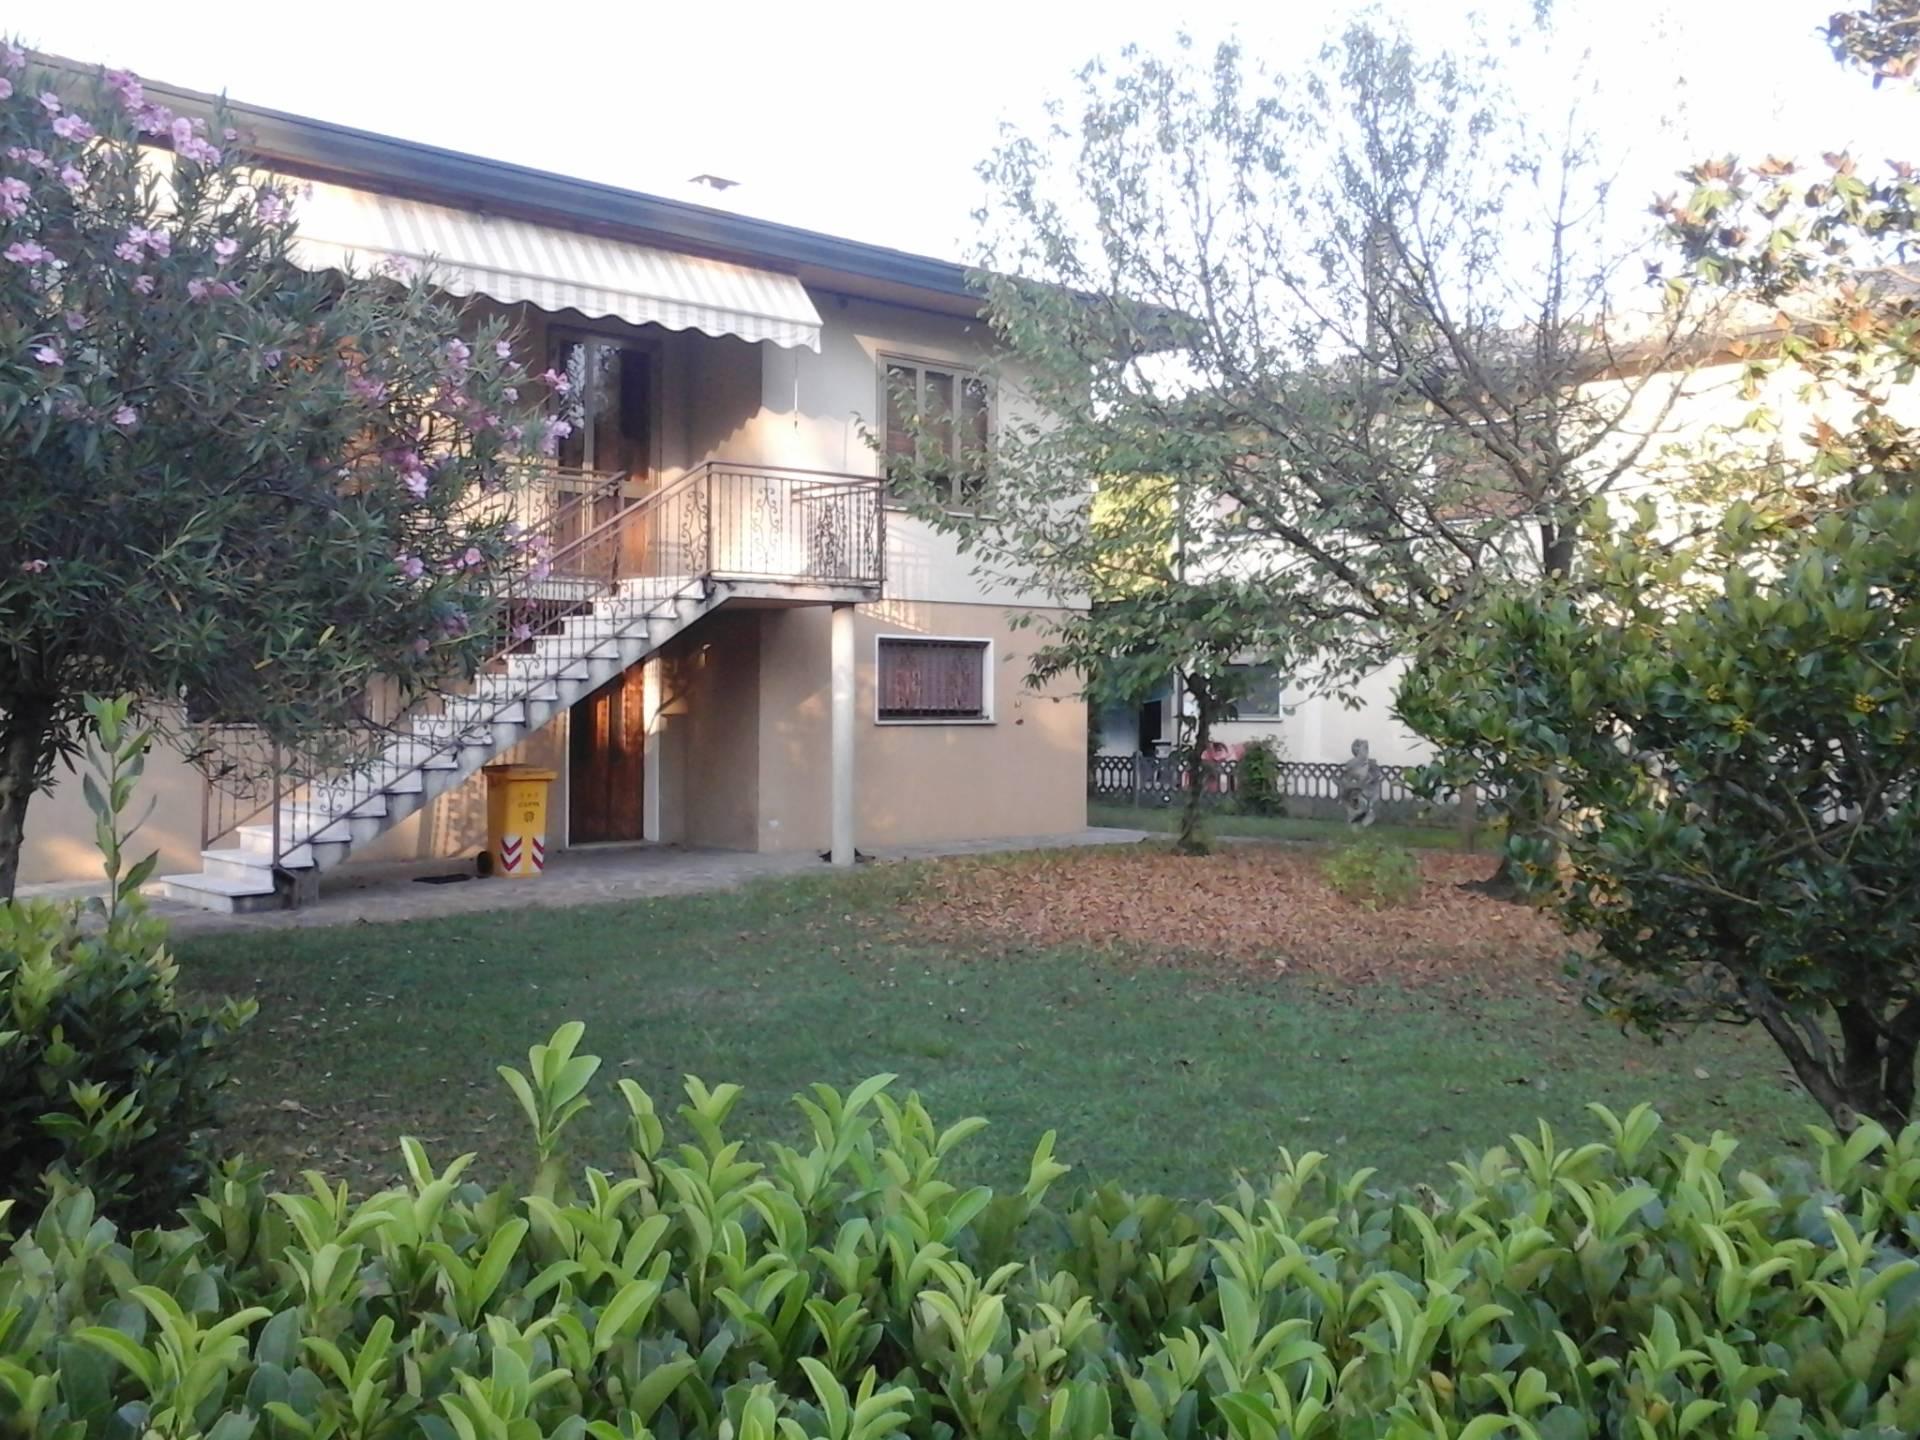 Soluzione Indipendente in Vendita a San Biagio di Callalta